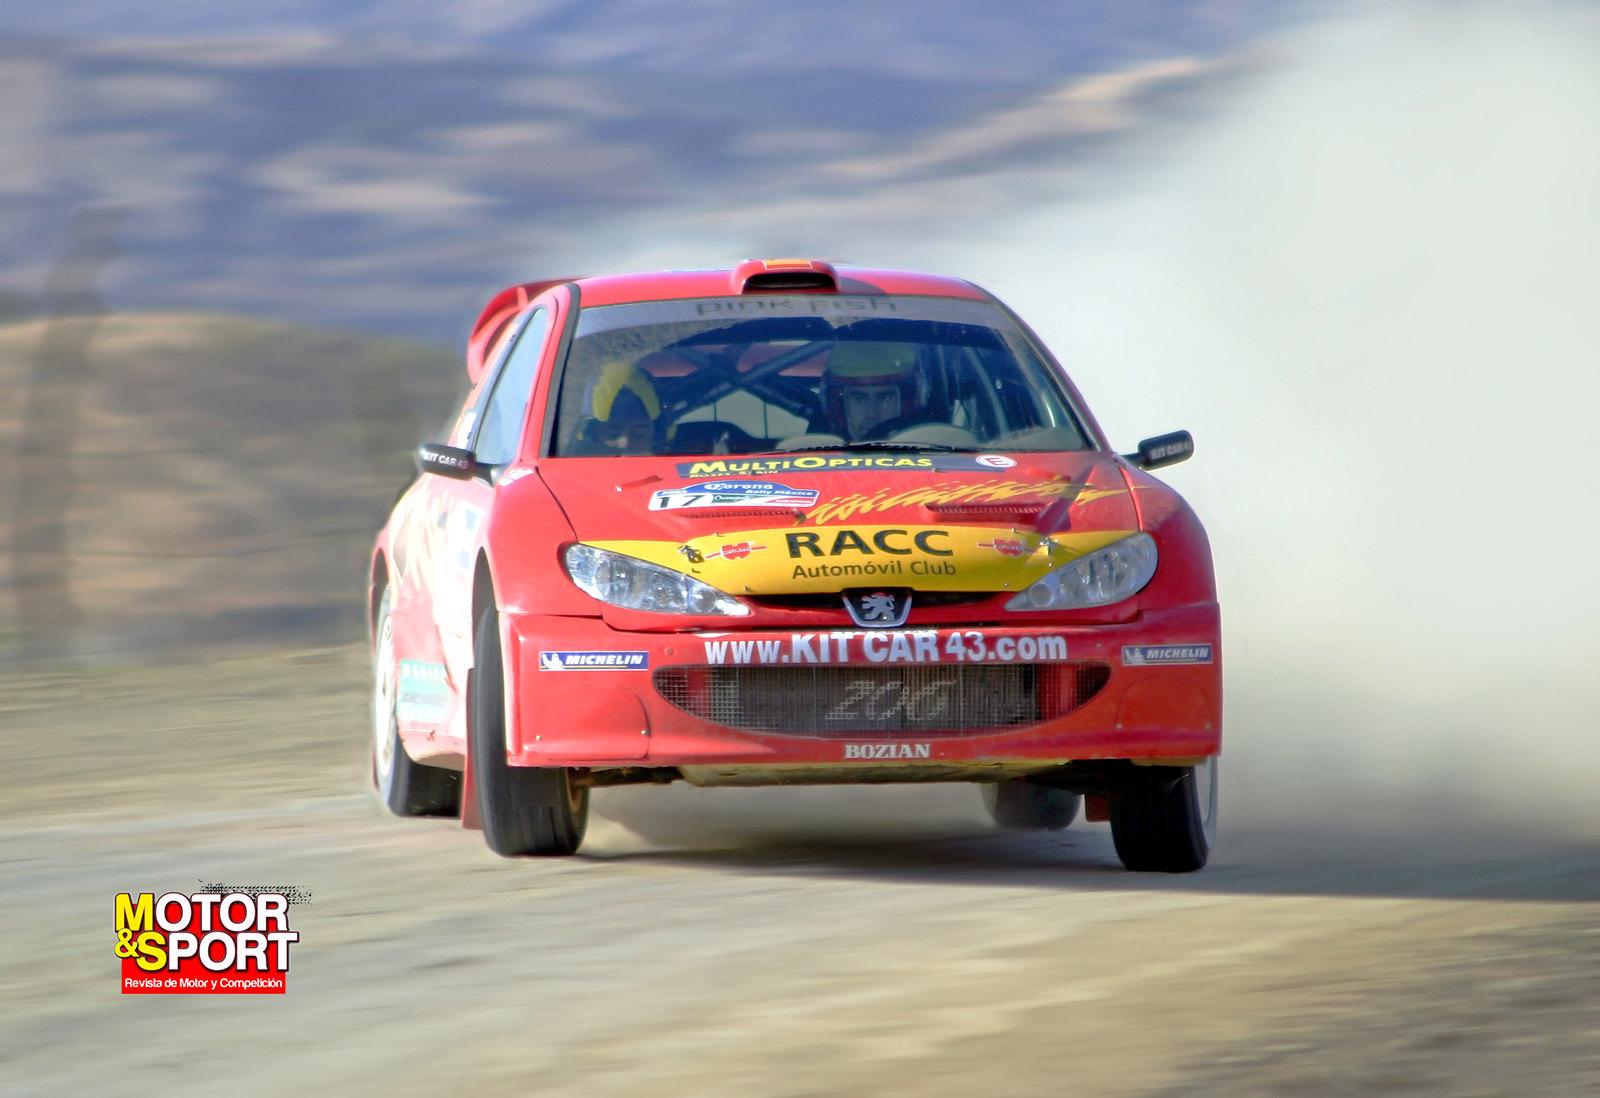 Rally Mexico 2005 16243162931_11a8d1cb2b_h